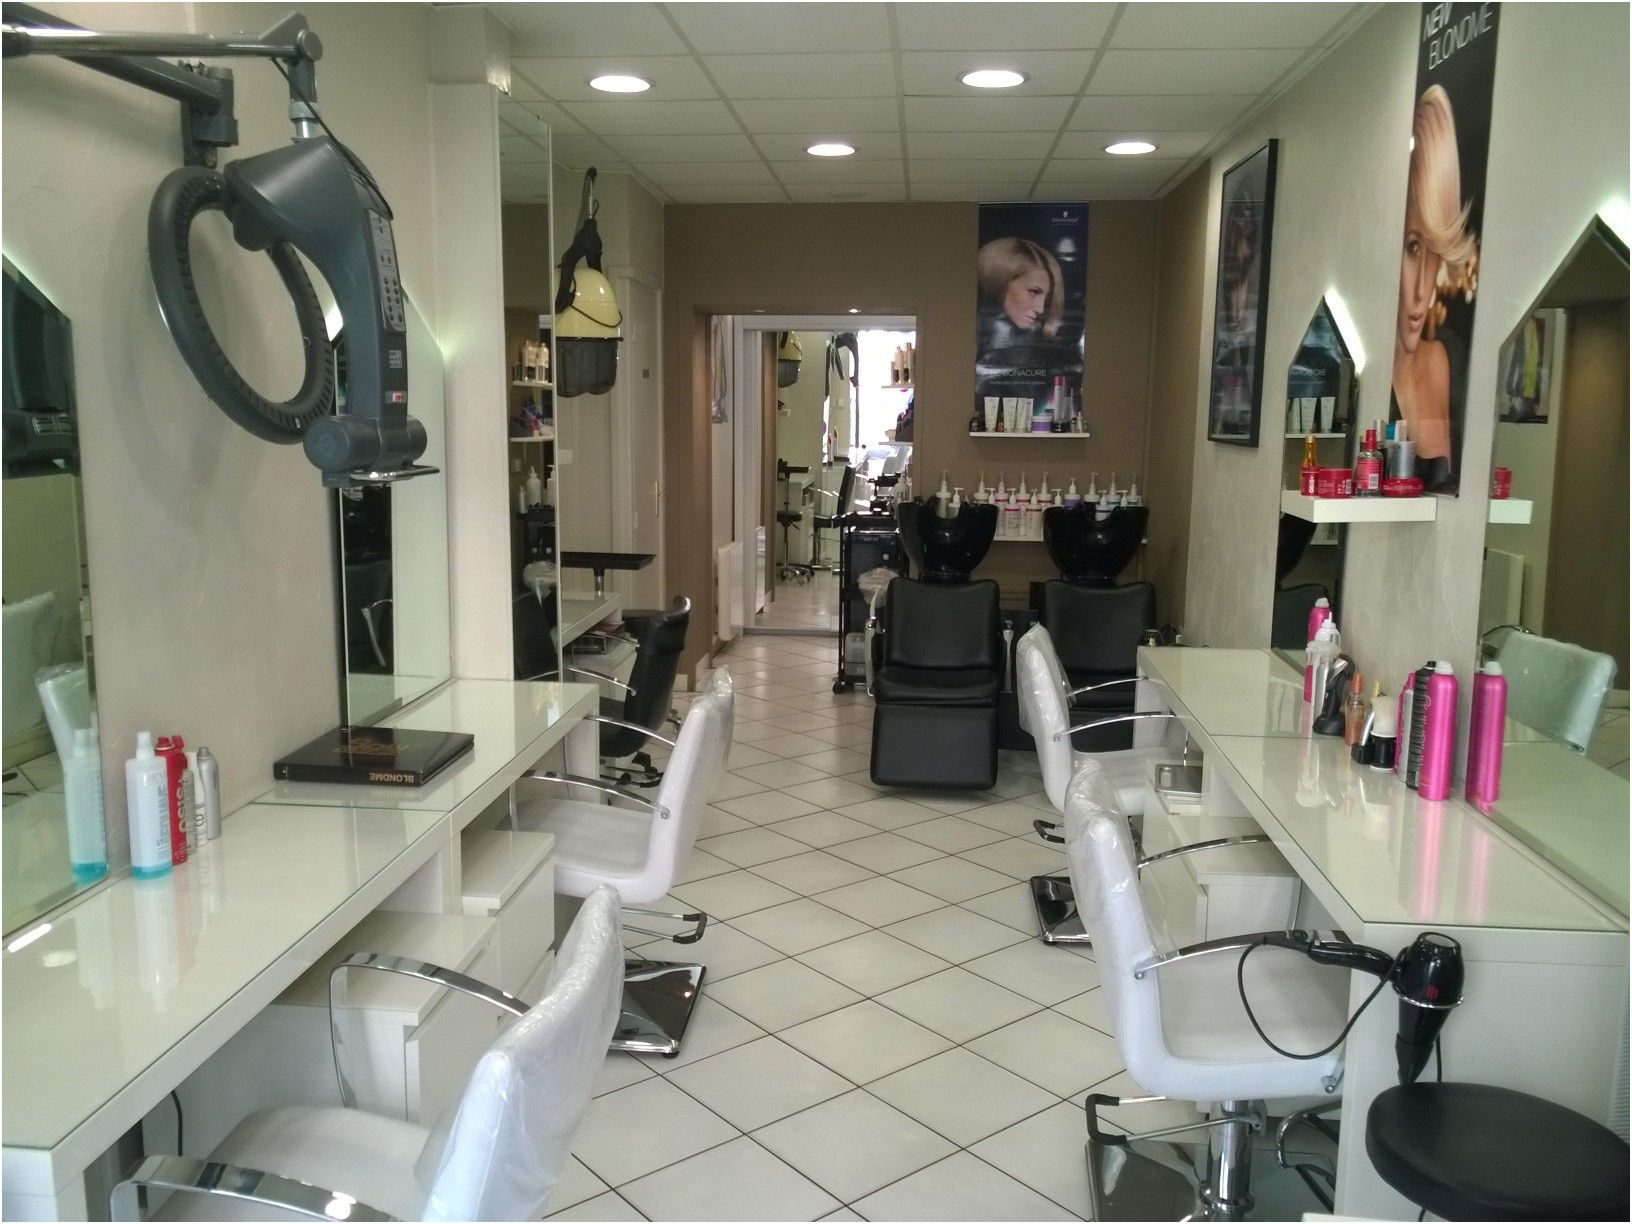 16 Salon De Coiffure Oriental Mantes La Jolie Modele Salon De Coiffure Afro Salon De Coiffure Coiffure